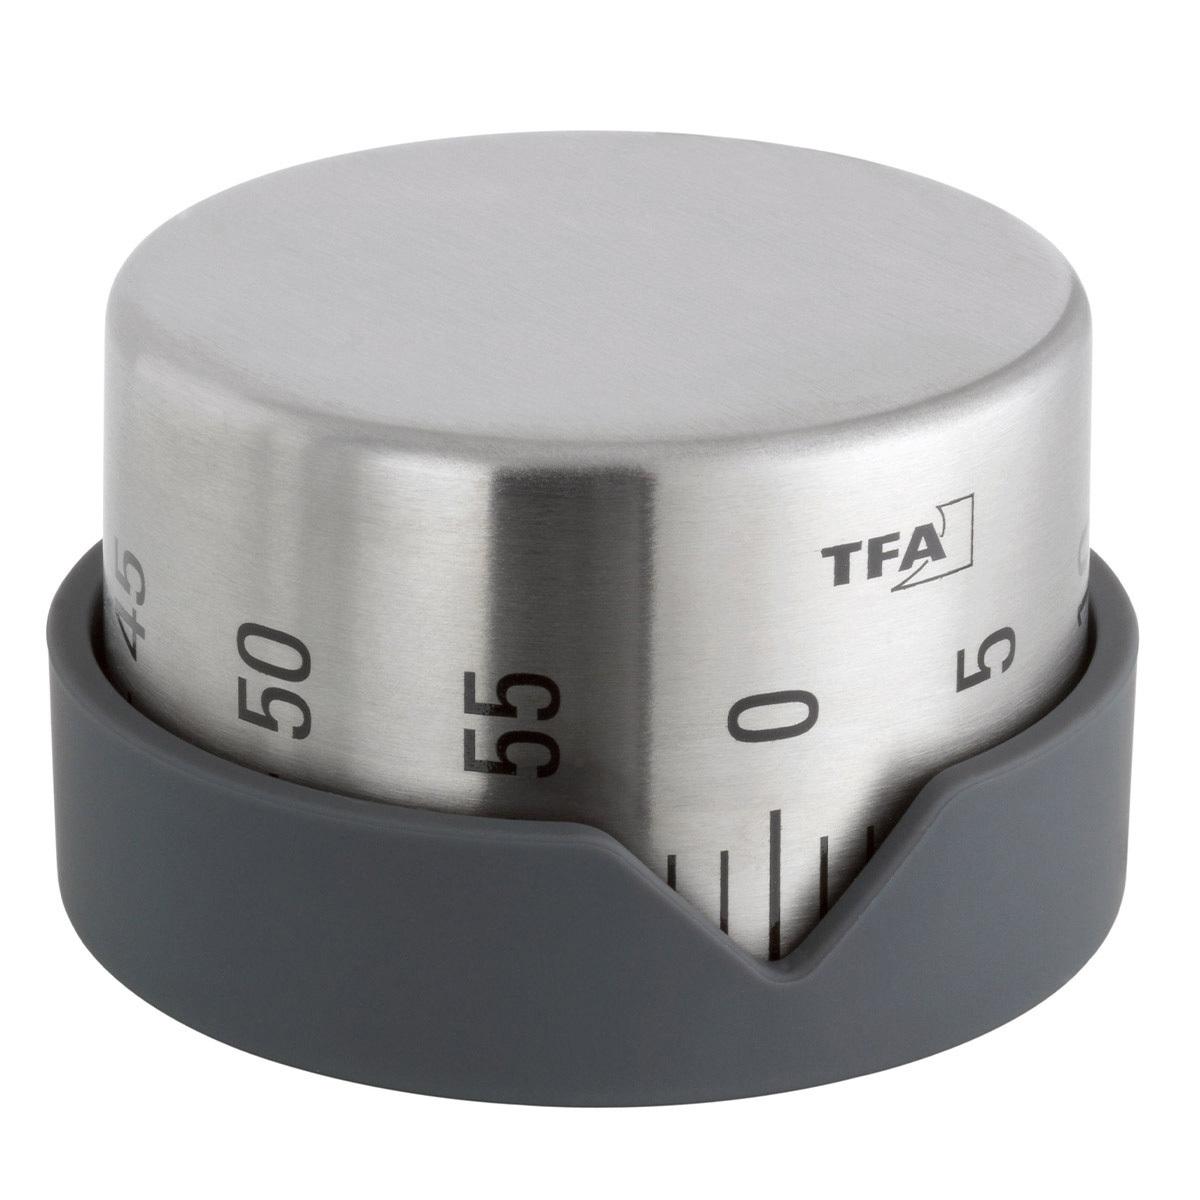 38-1027-10-analoger-küchen-timer-dot-1200x1200px.jpg